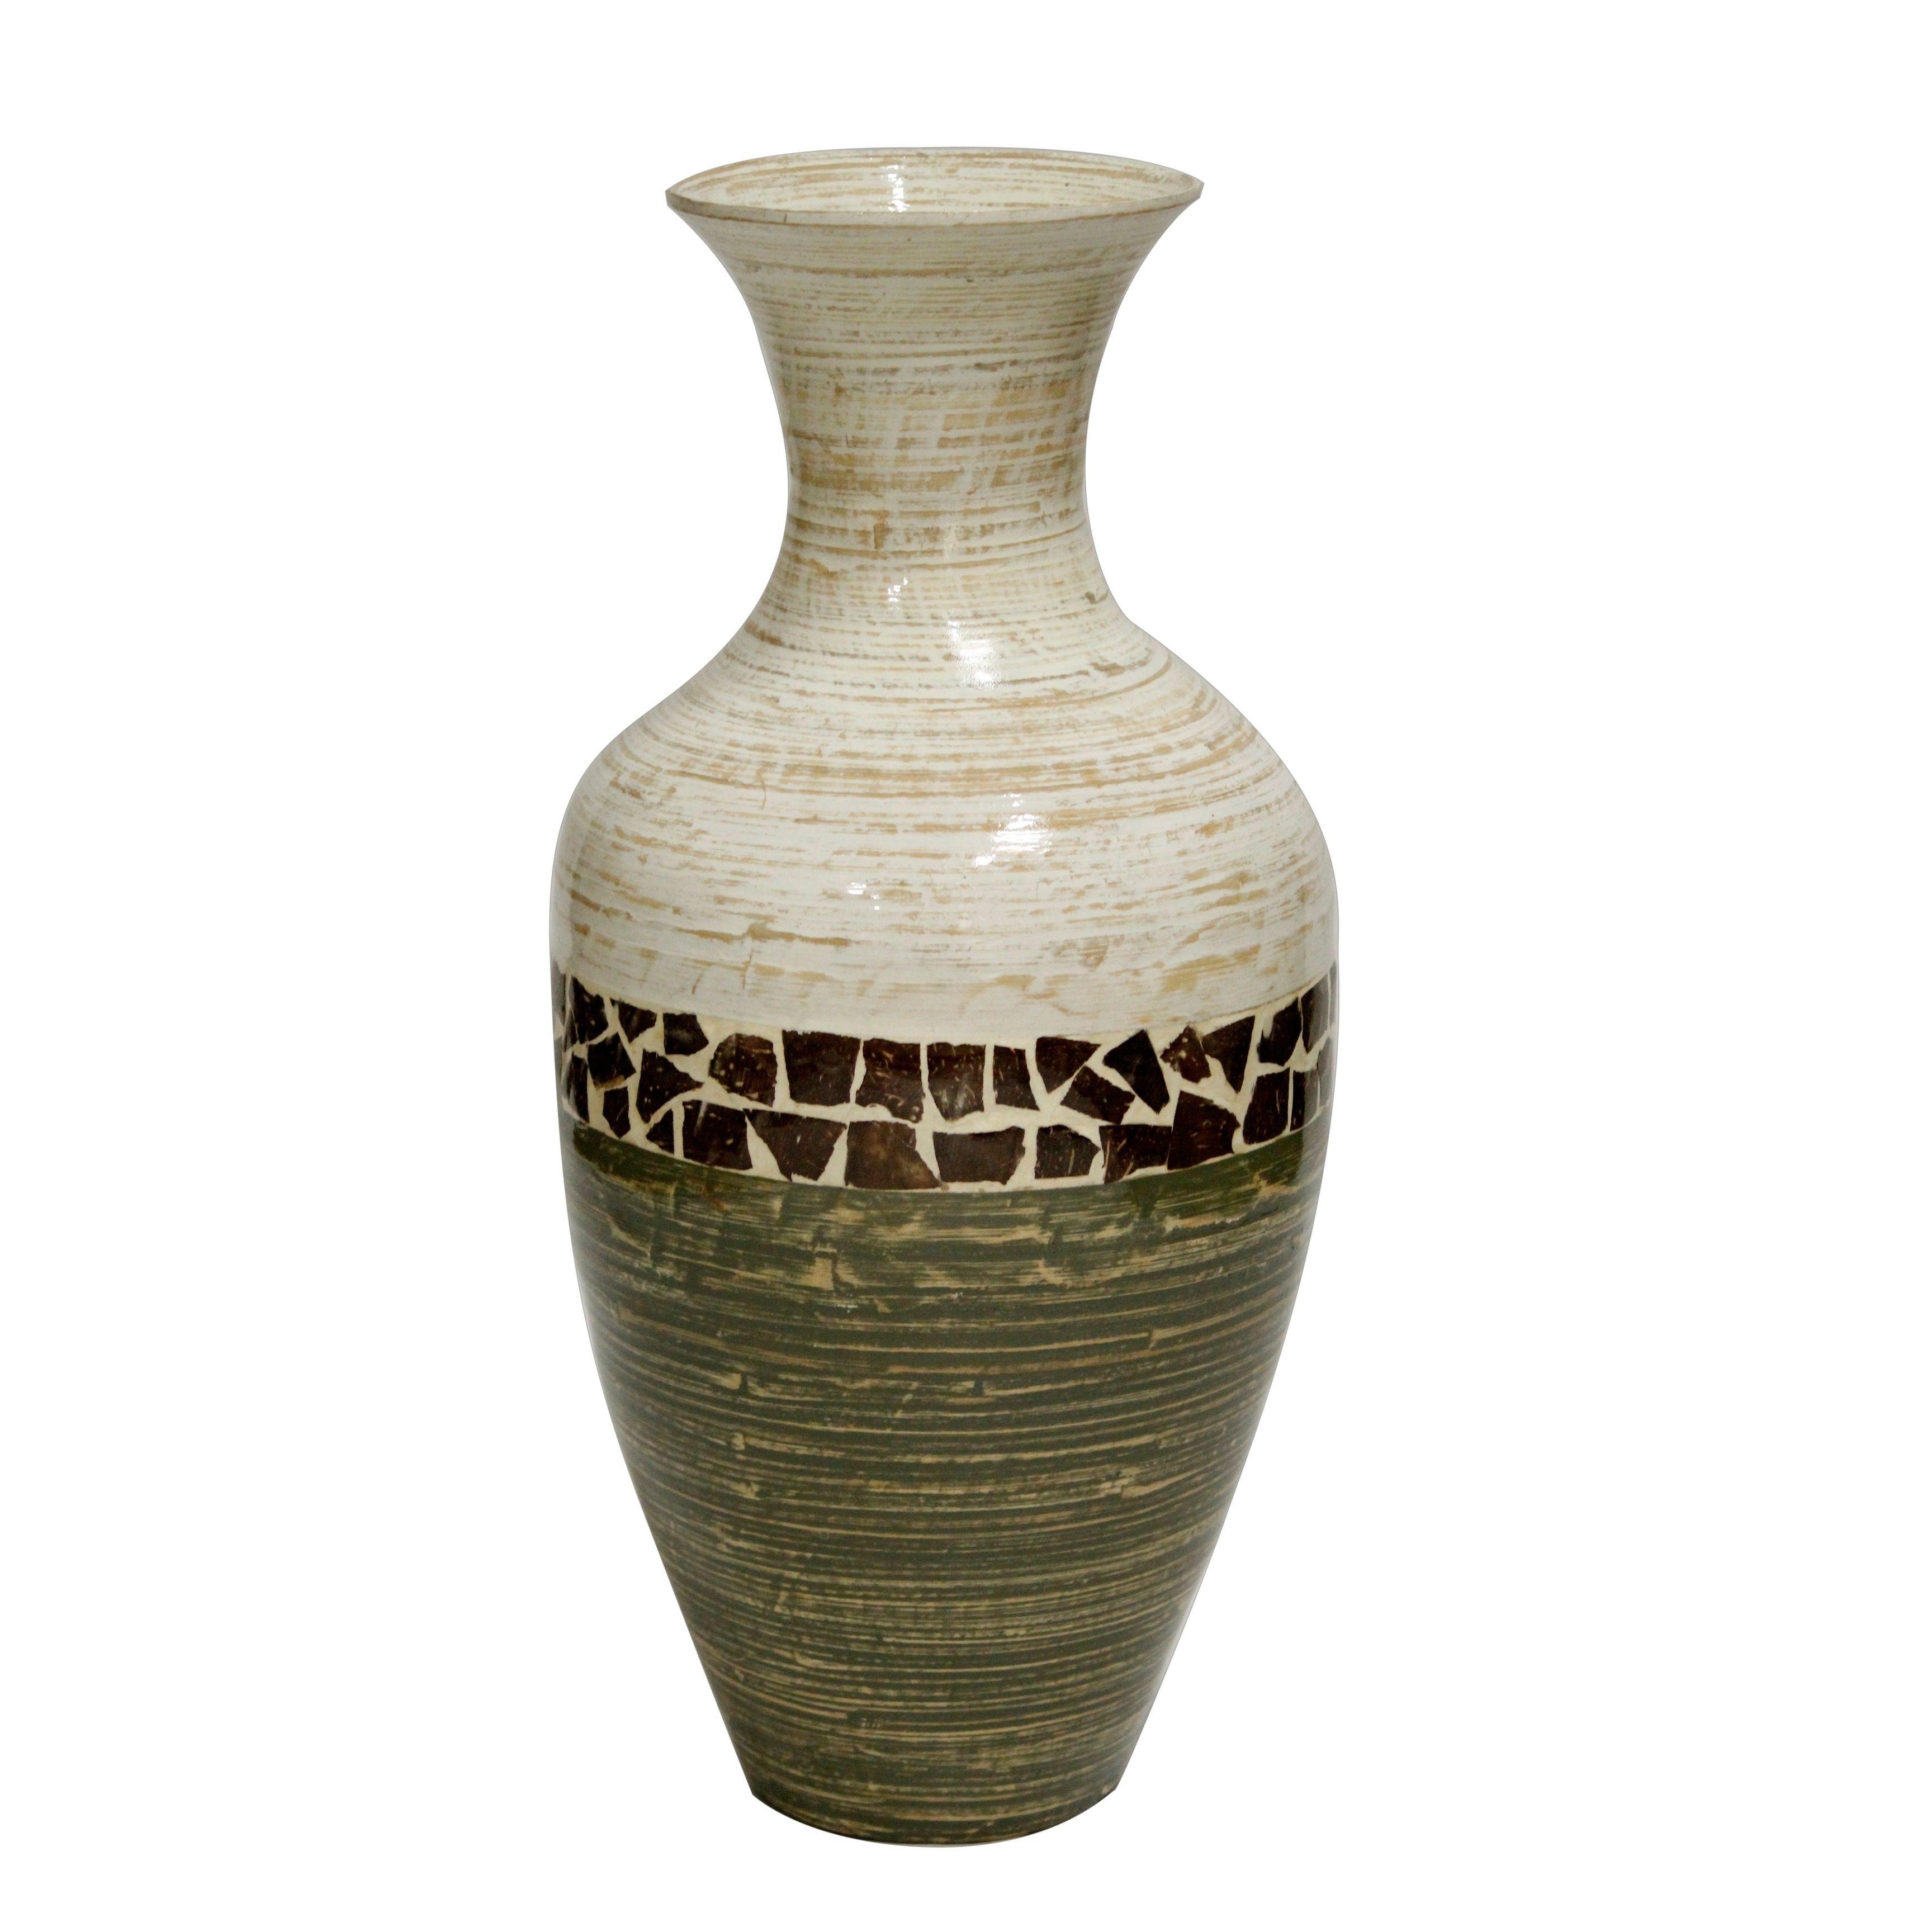 metallic mosaic terracotta floor vase of terra cotta floor vase pertaining to terry 25 spun bamboo floor vase white and green w coconut shell